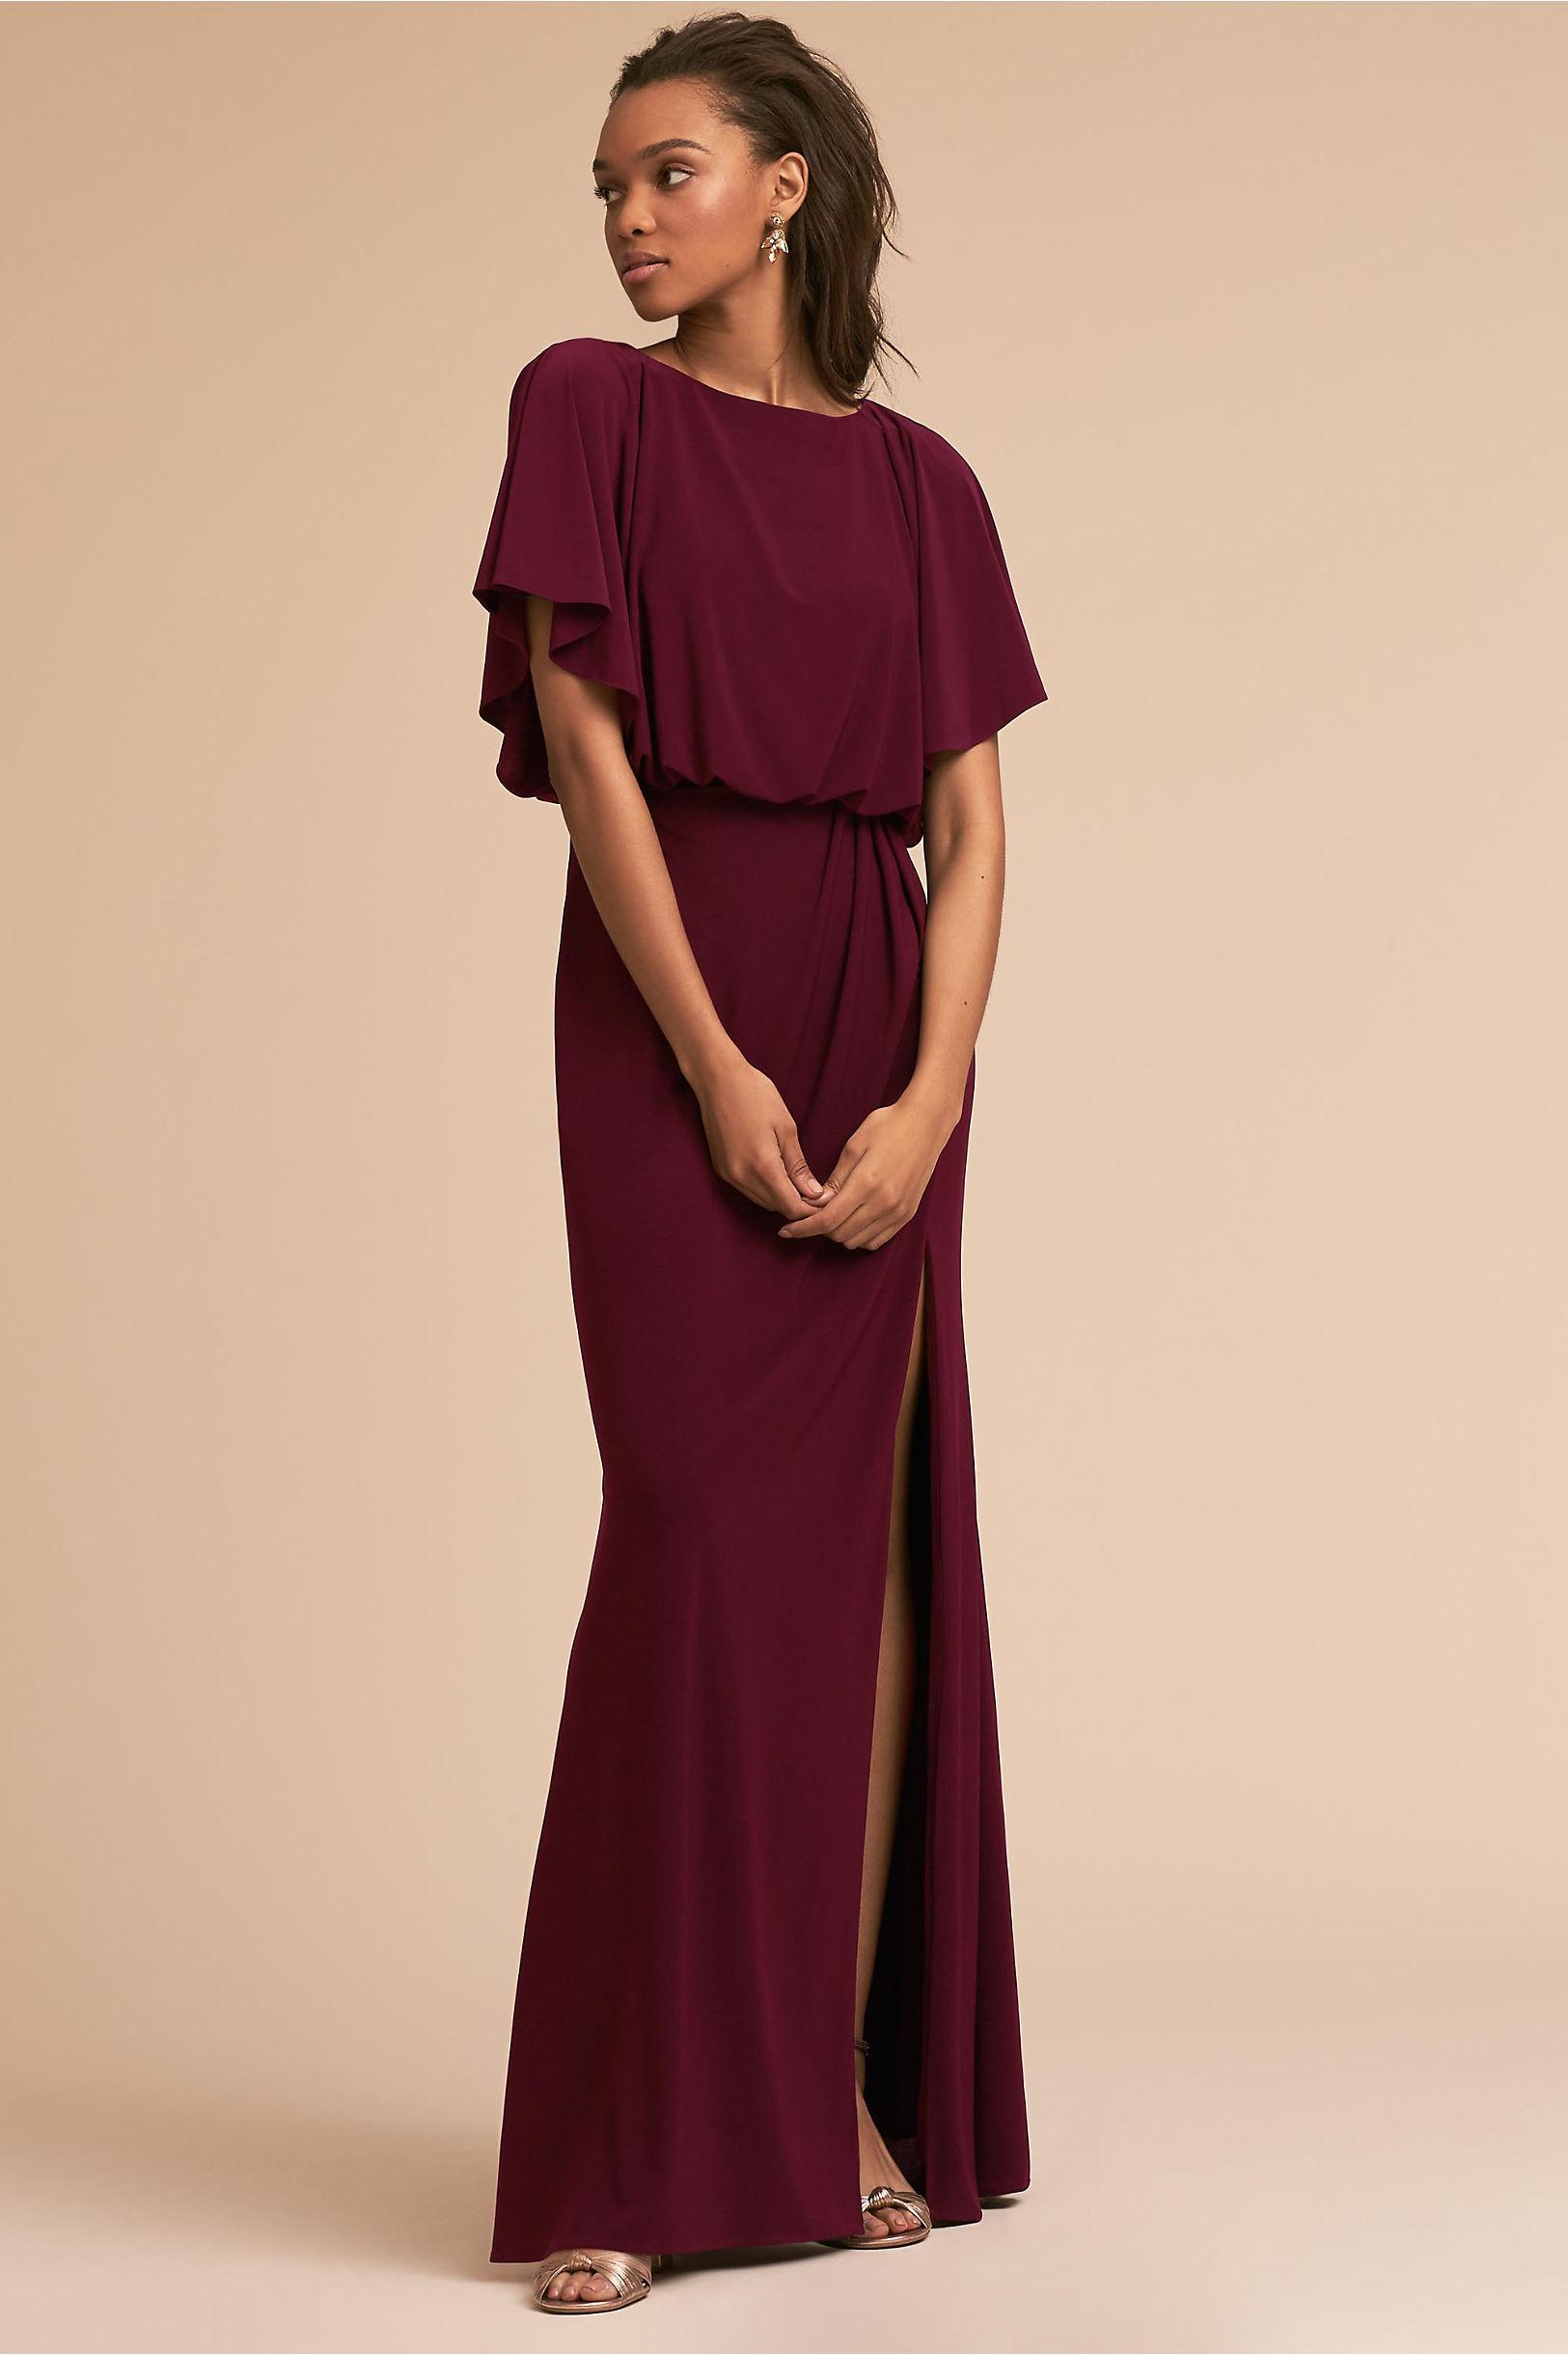 mother of the bride dresses long length, short length, and tea length